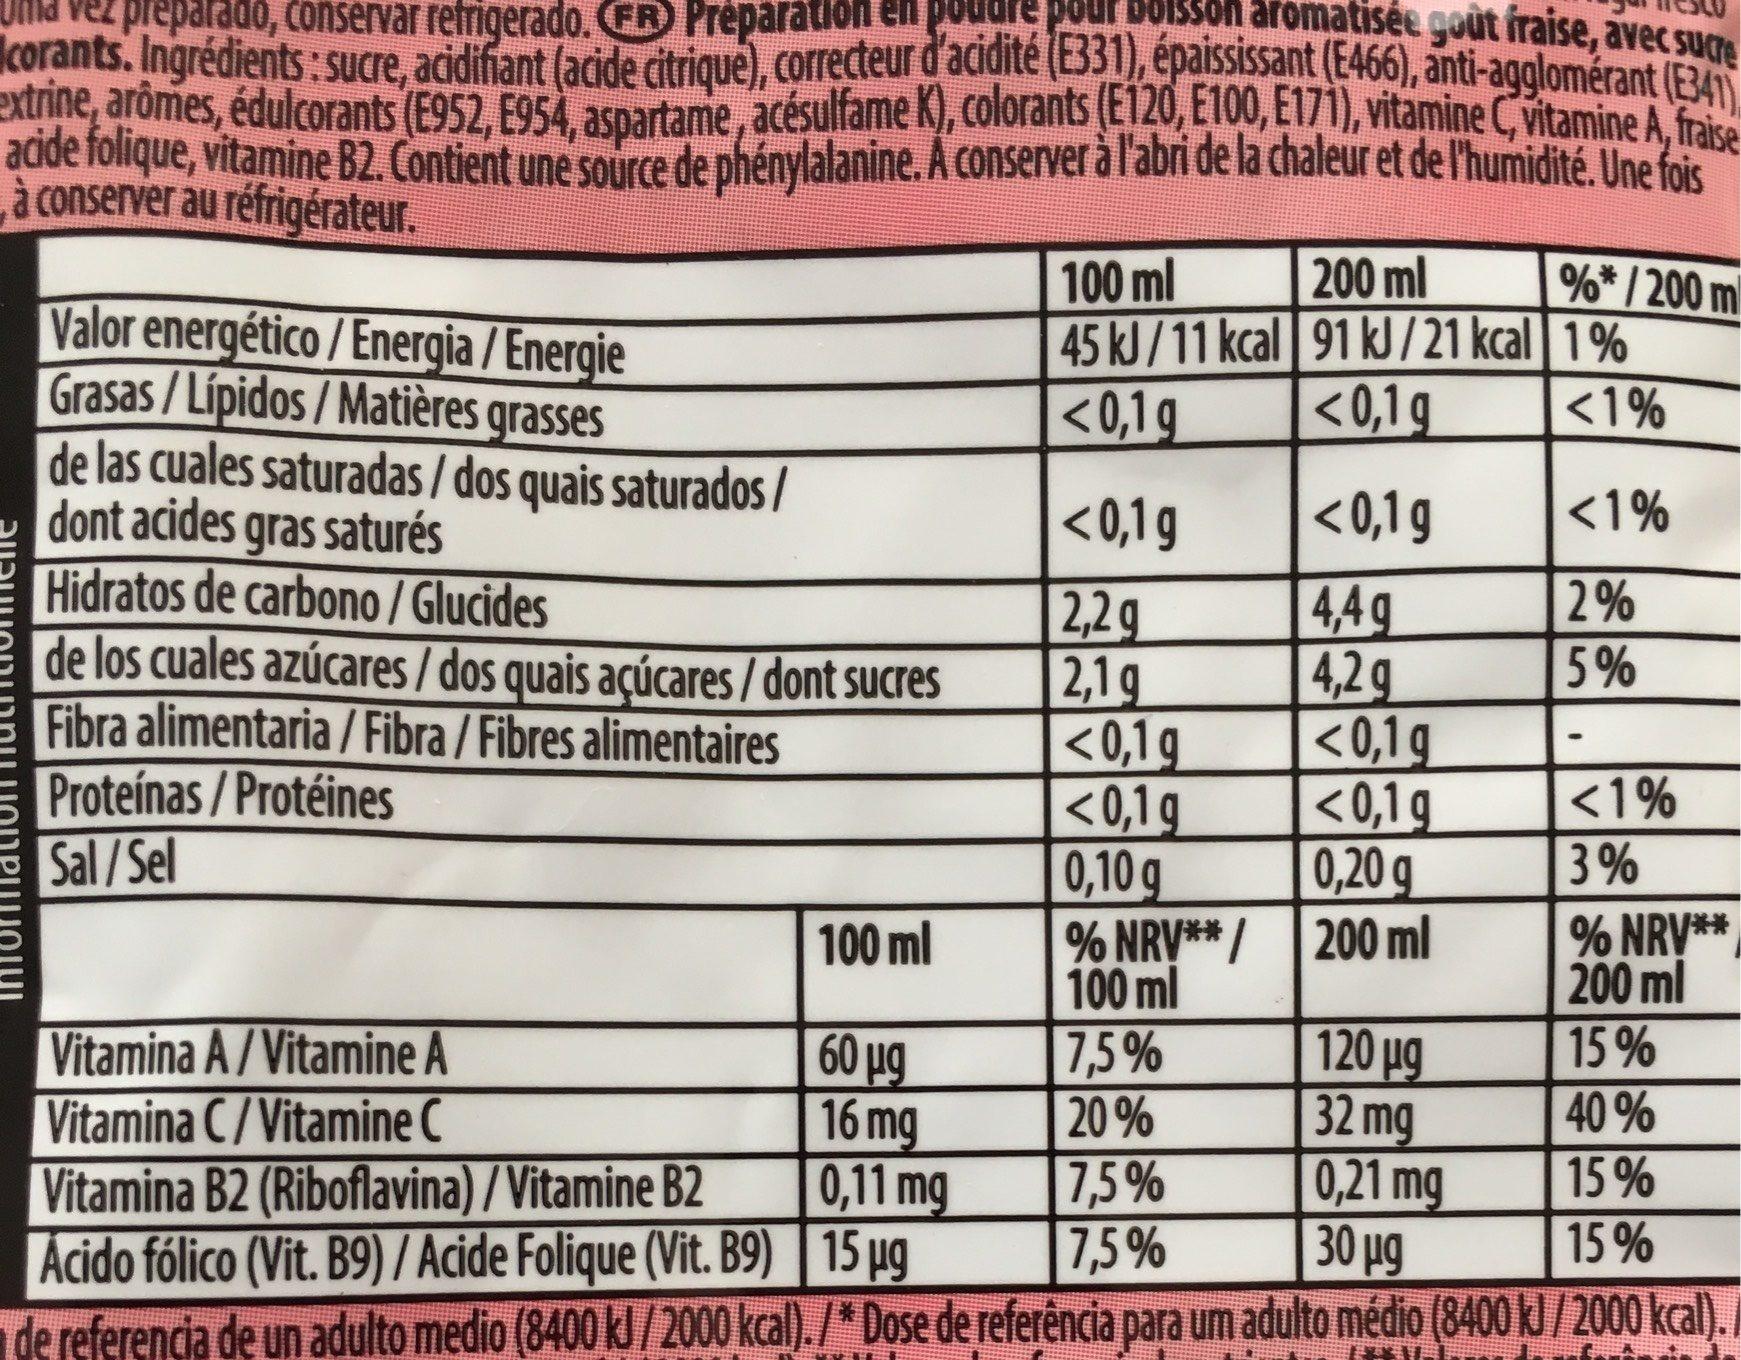 Sabor Morango Fresa - Informations nutritionnelles